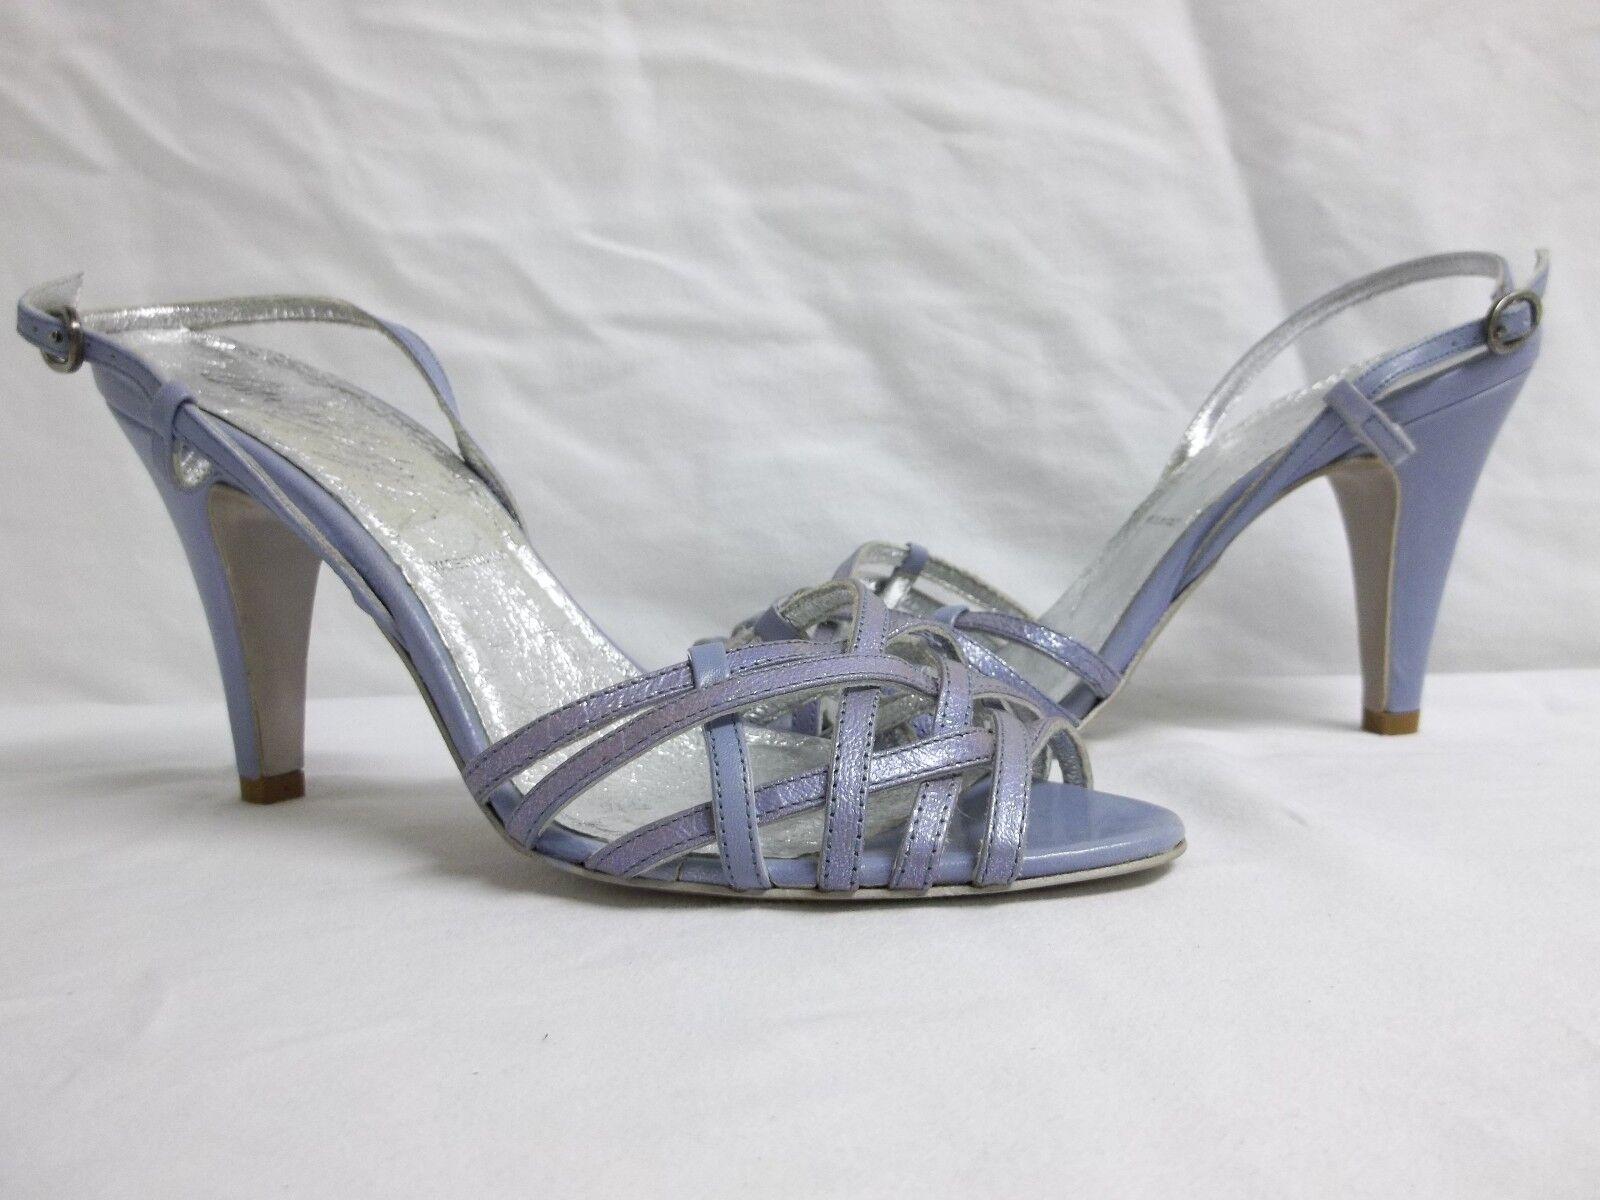 Miss Sixty EU 39 Us Toe 8.5 M Ball Bark Pelle Open Toe Us Heels New Donna Shoes NWOB 4c3cb3